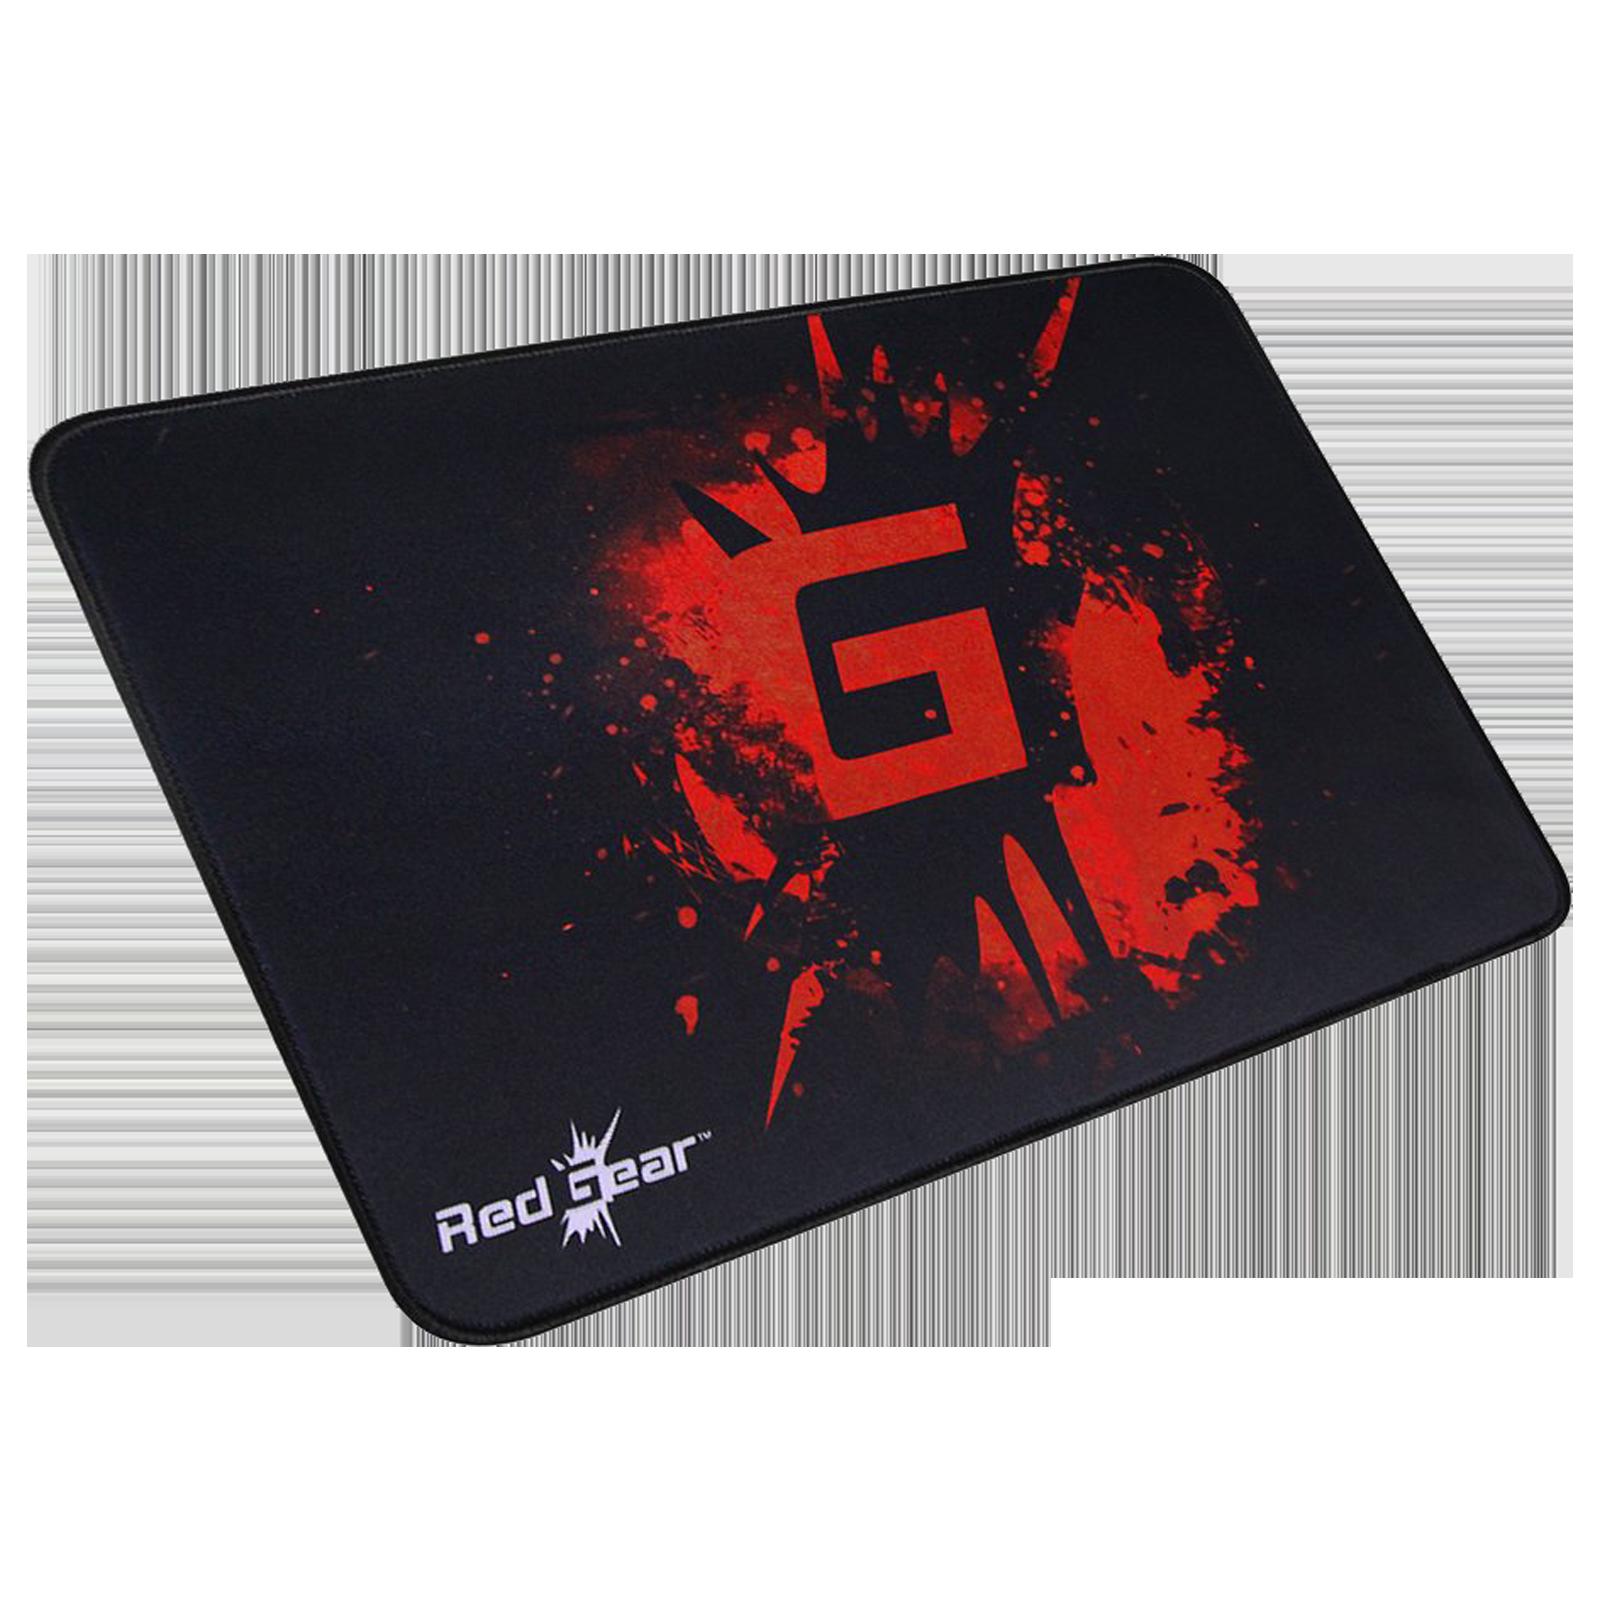 Redgear MP35 Gaming Mouse Pad (Soft Non-Slip Base, 8904130838132, Black)_1